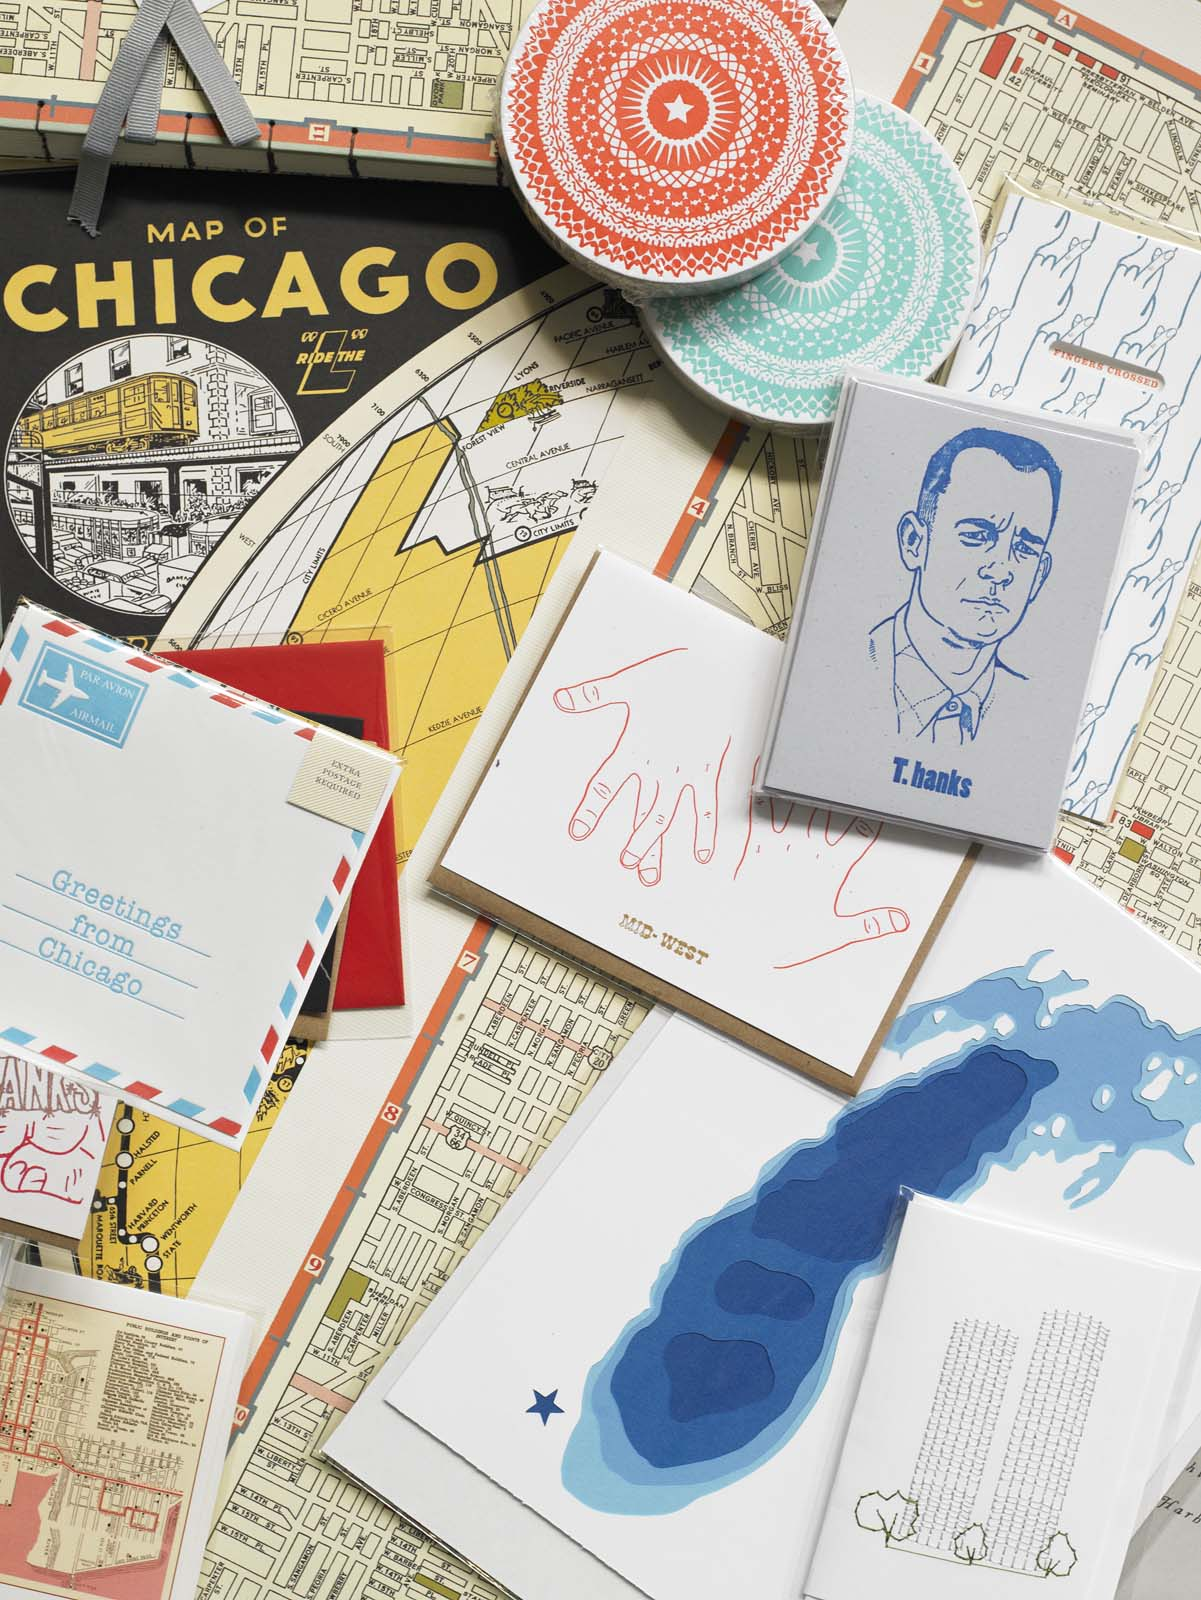 Letterpress goods at Greer in Chicago